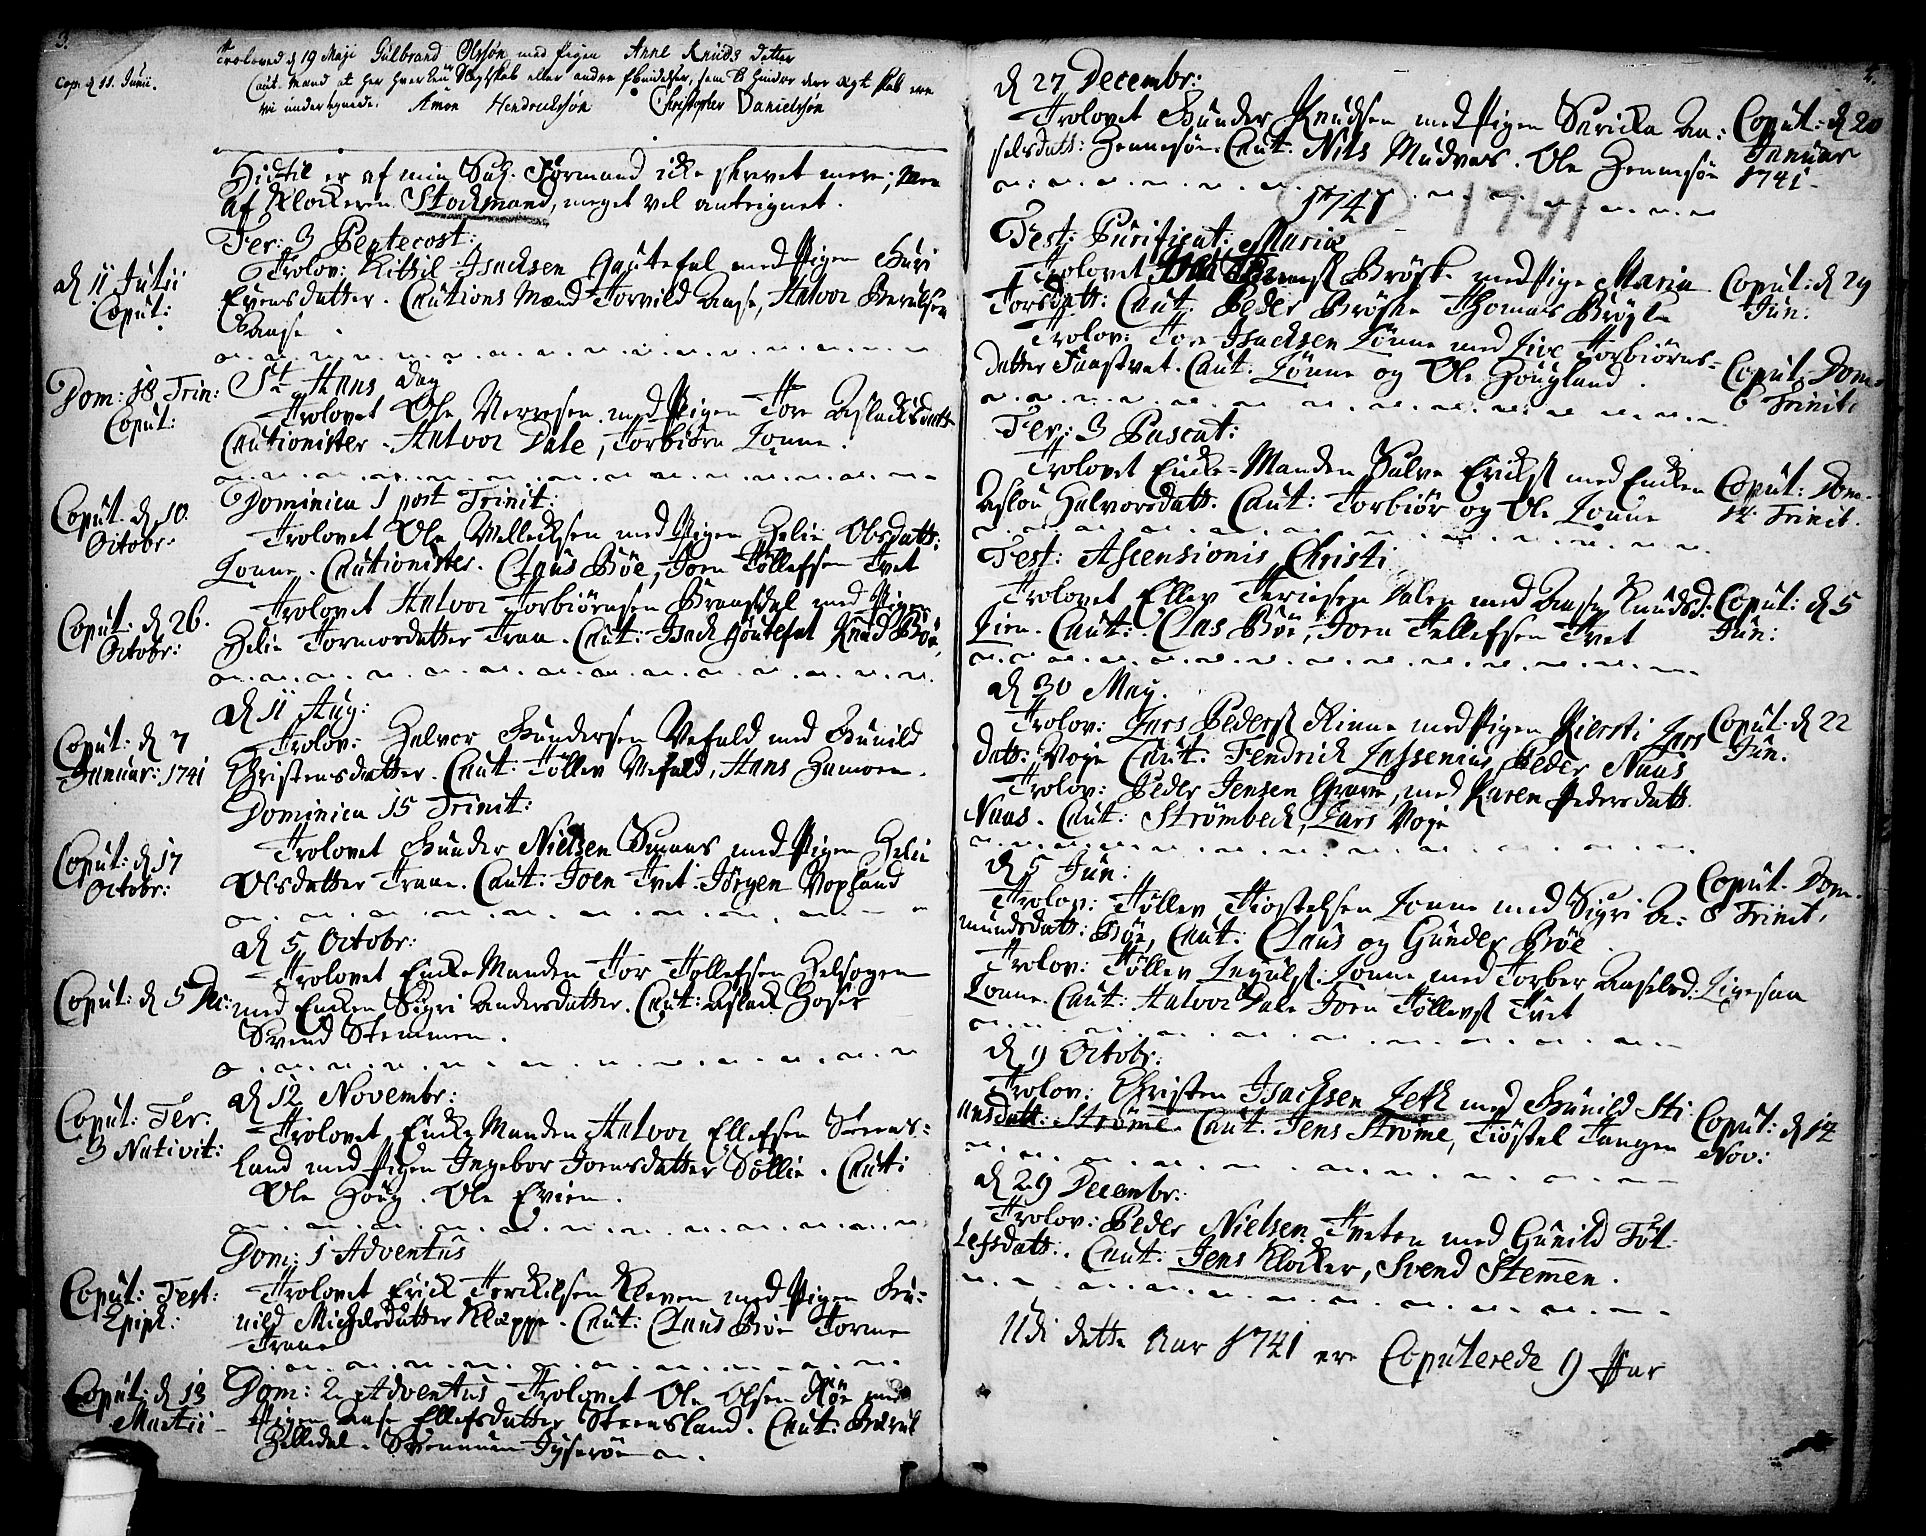 SAKO, Drangedal kirkebøker, F/Fa/L0001: Ministerialbok nr. 1, 1697-1767, s. 3-4